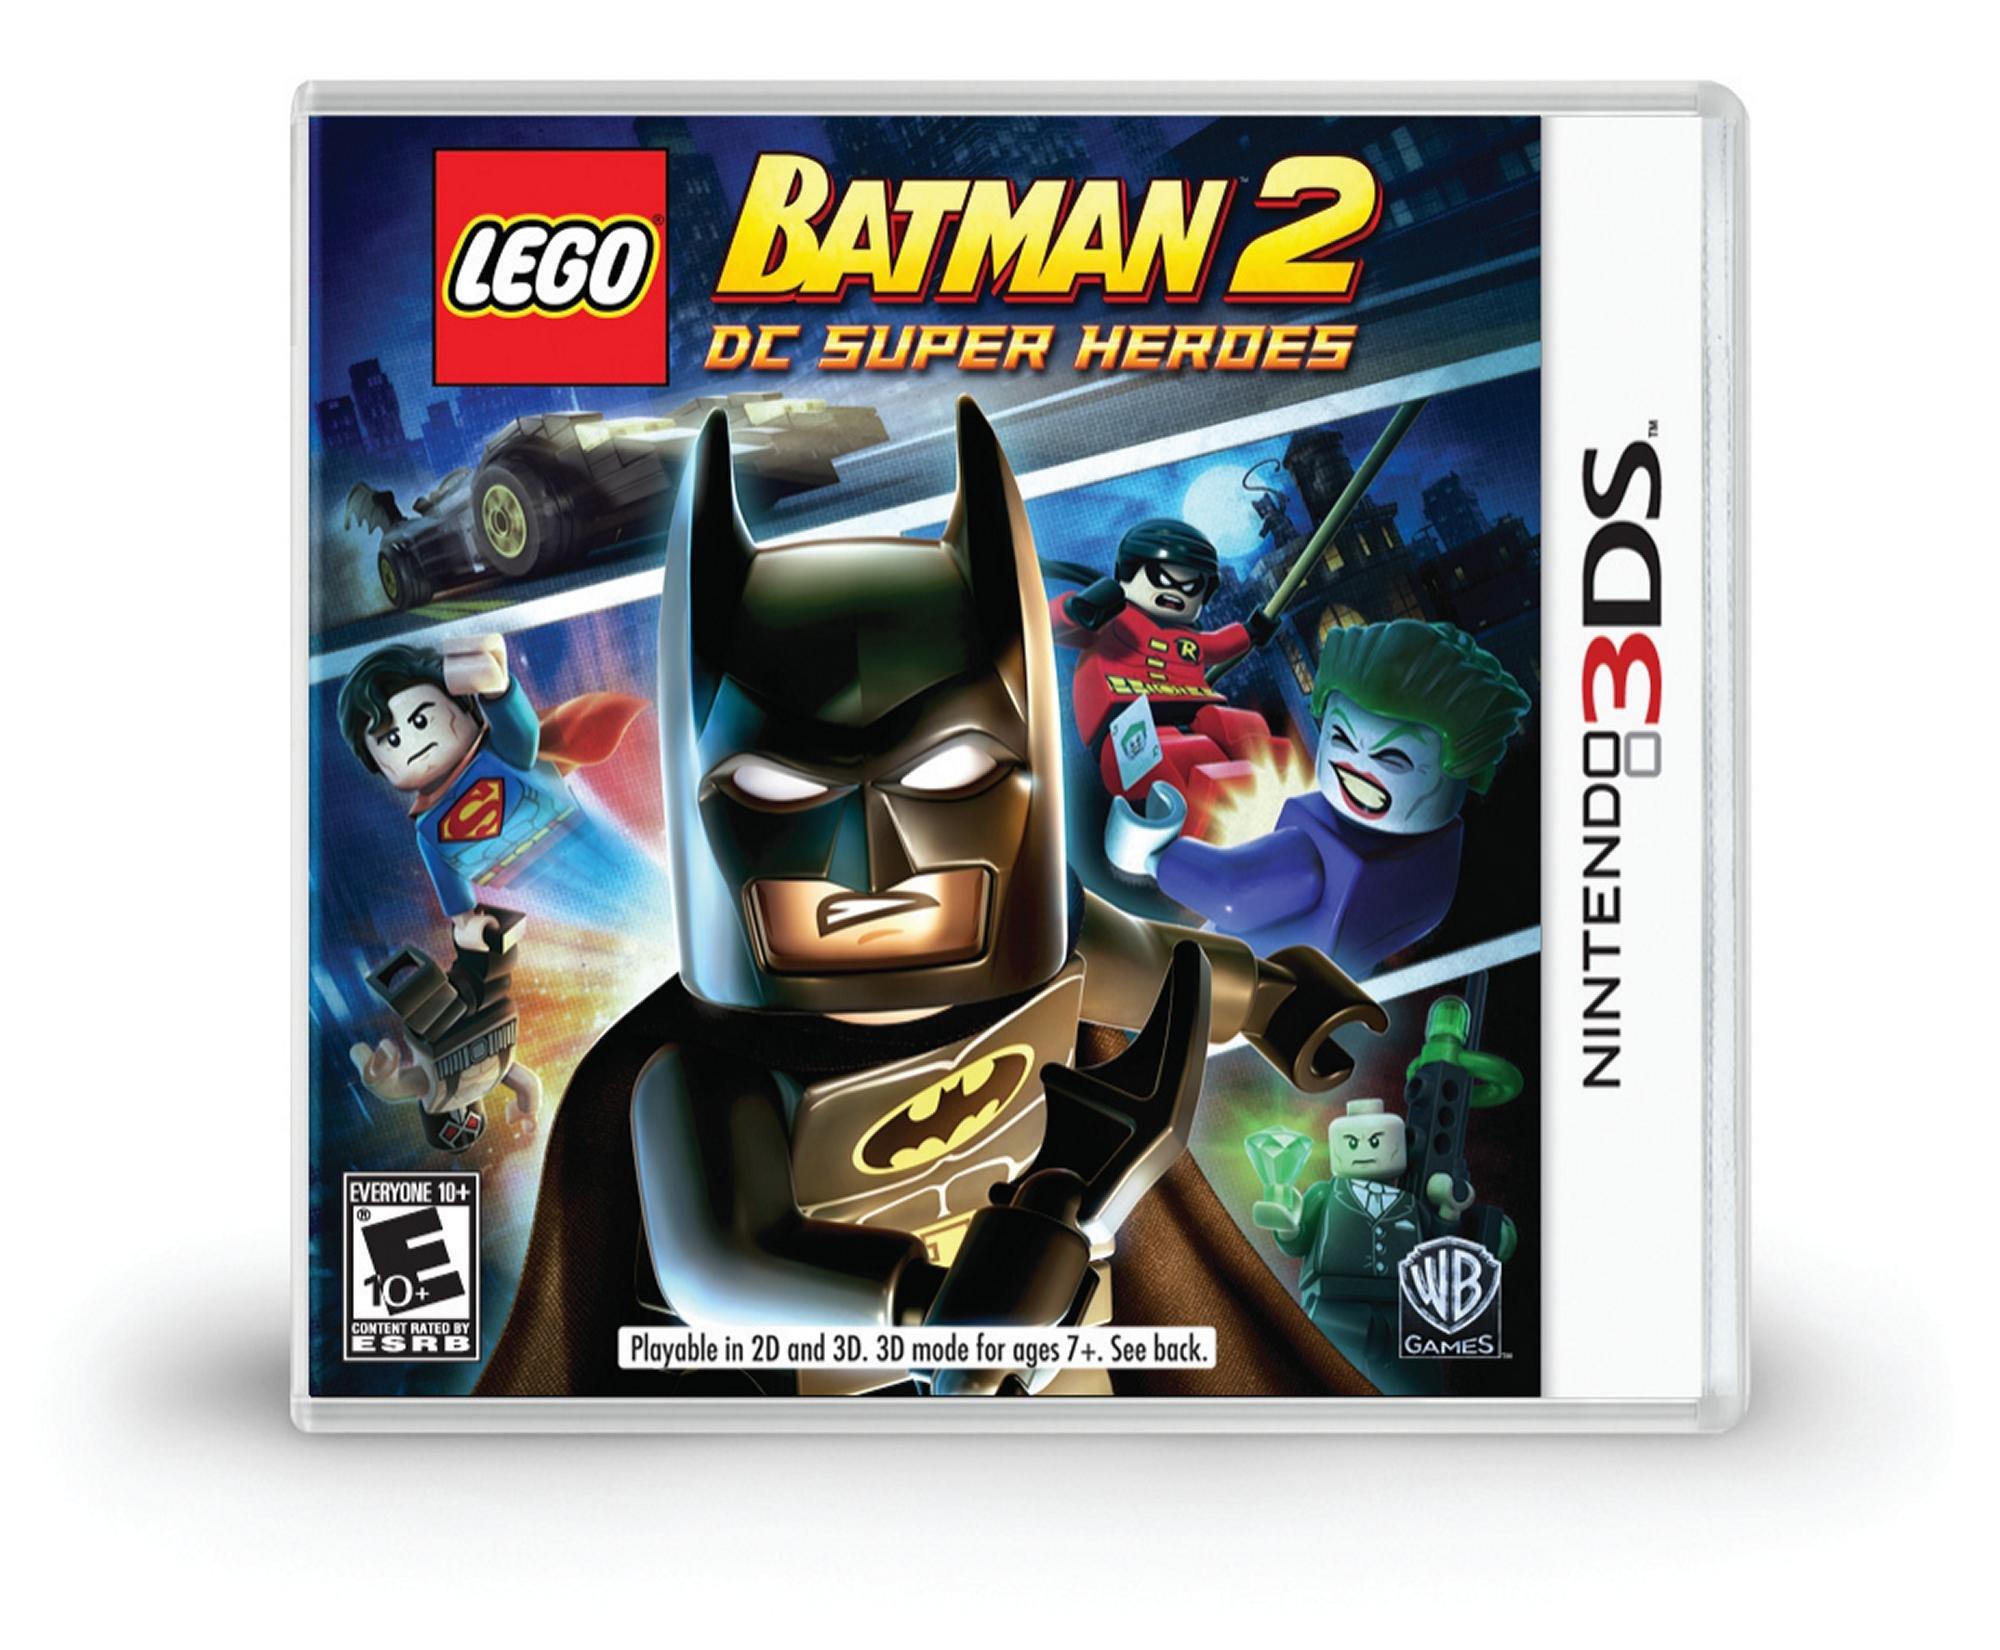 LEGOBatman2: DC Super Heroes - Nintendo 3DS